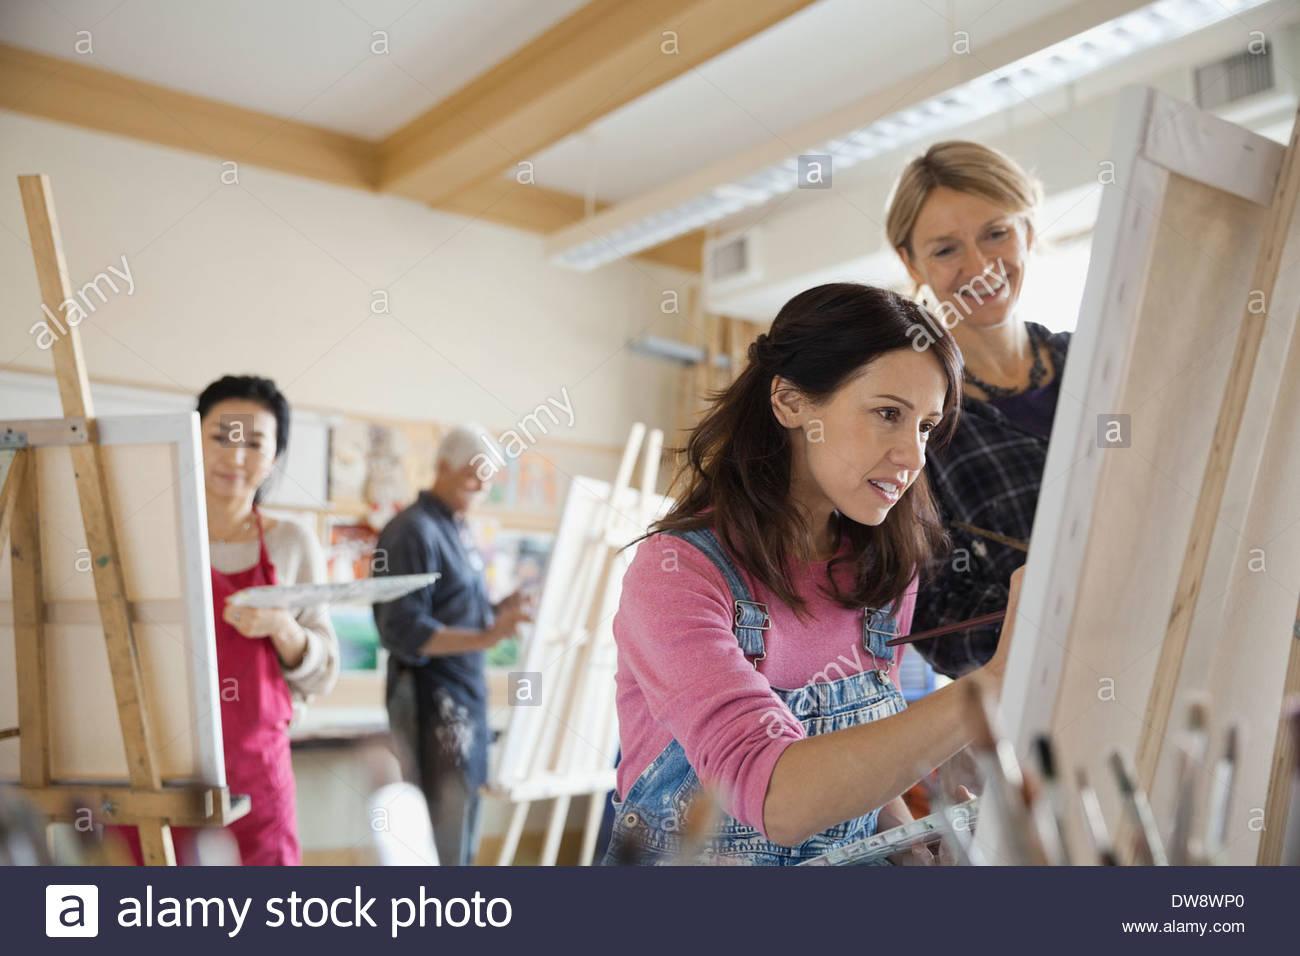 Mujer tomando clases de pintura para adultos Imagen De Stock